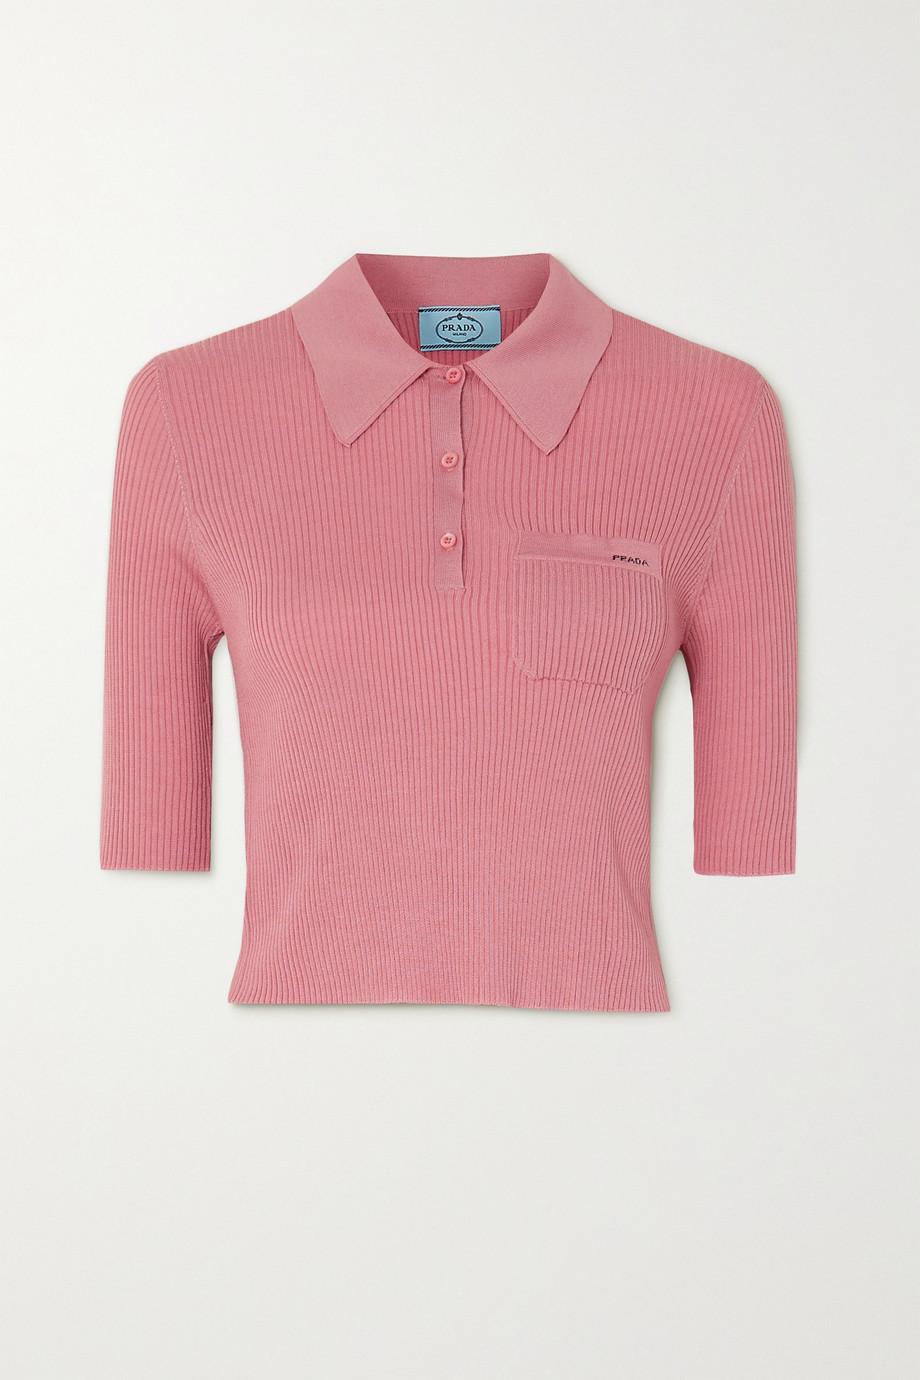 Prada Cropped ribbed wool-blend polo shirt